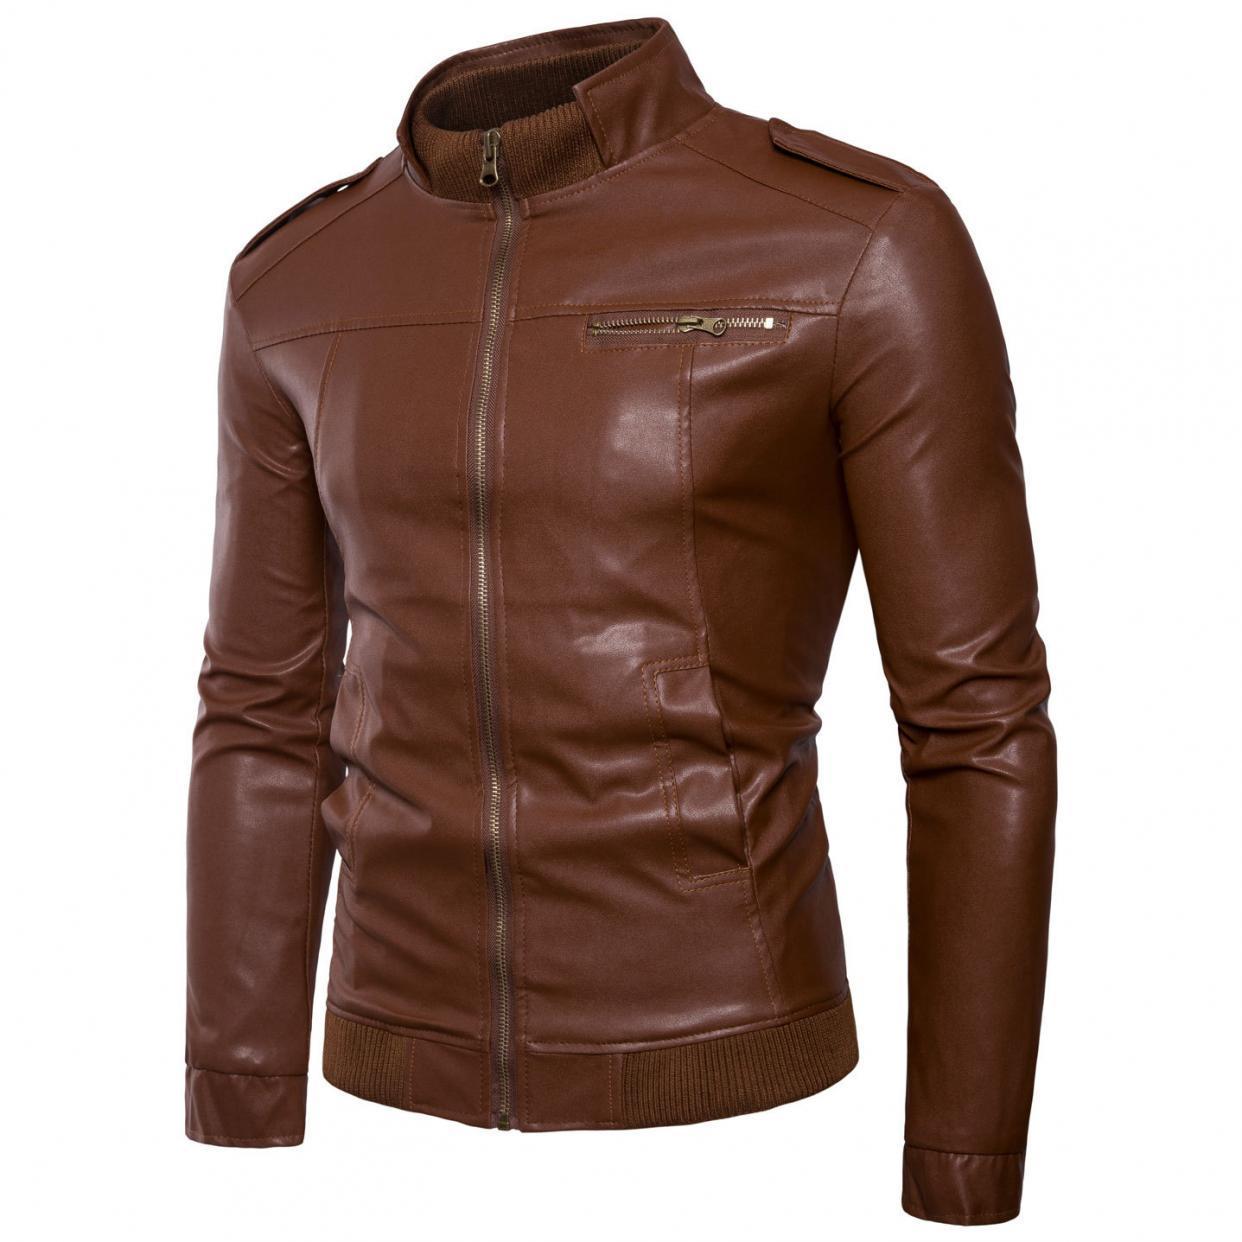 d074405f160e Leather Jackets for Men for sale - Mens Leather Jackets Online Deals ...